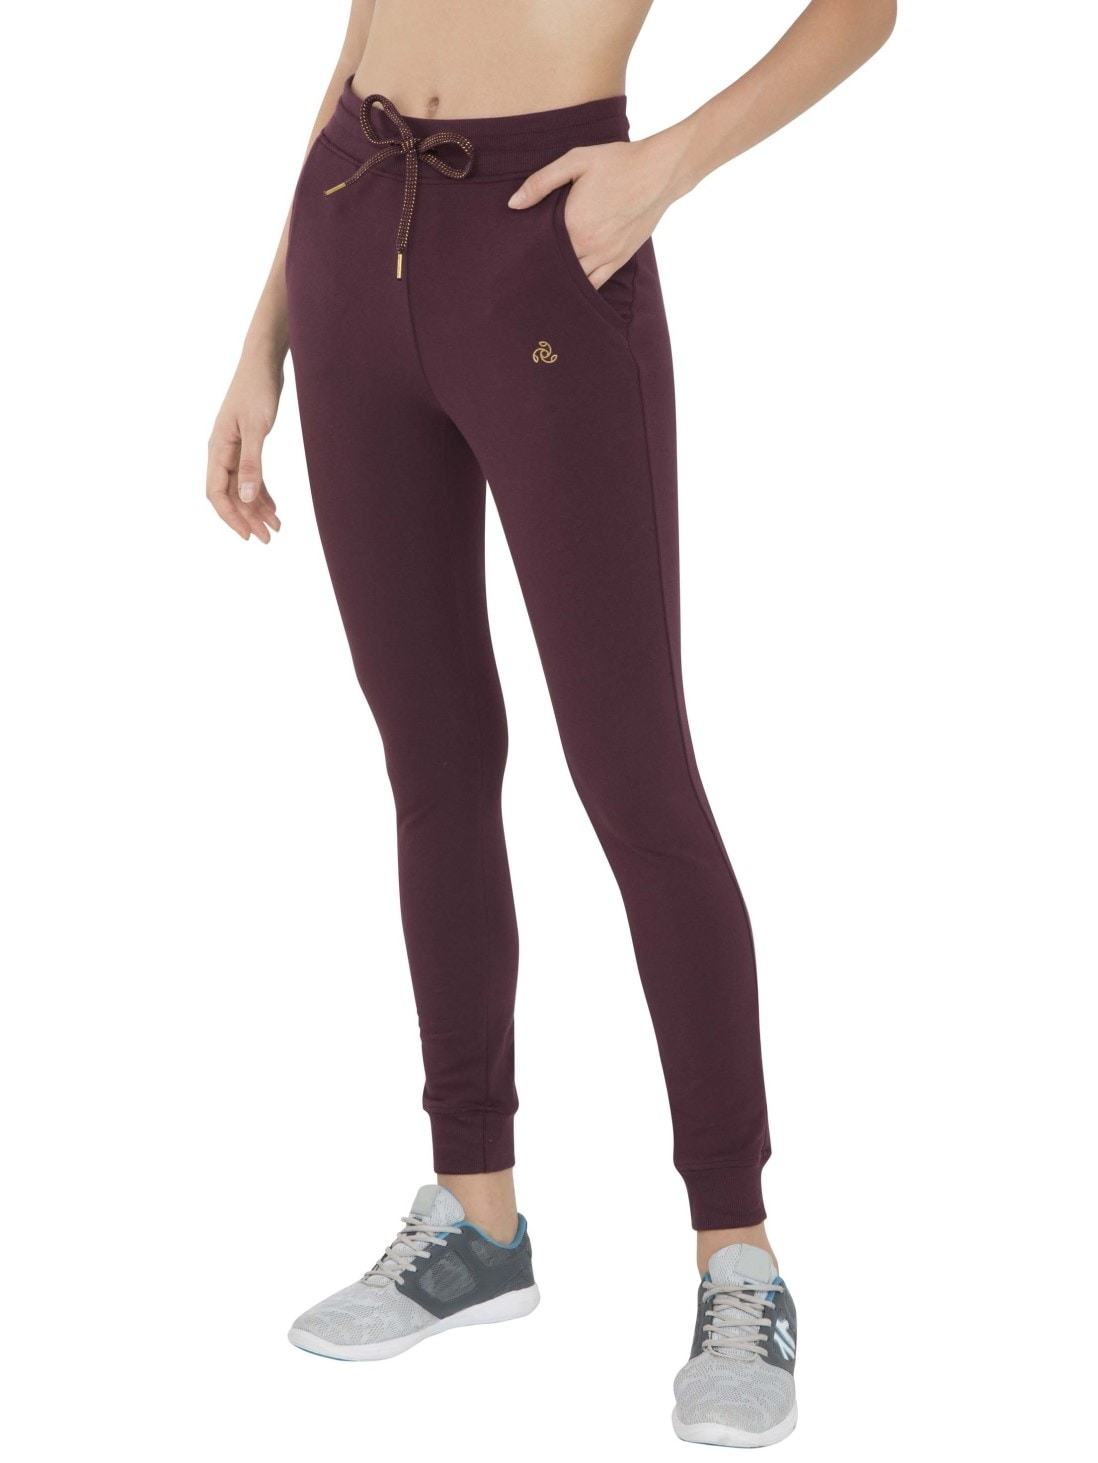 Jockey Womens Wine Cuffed Track Pant (M,Wine)